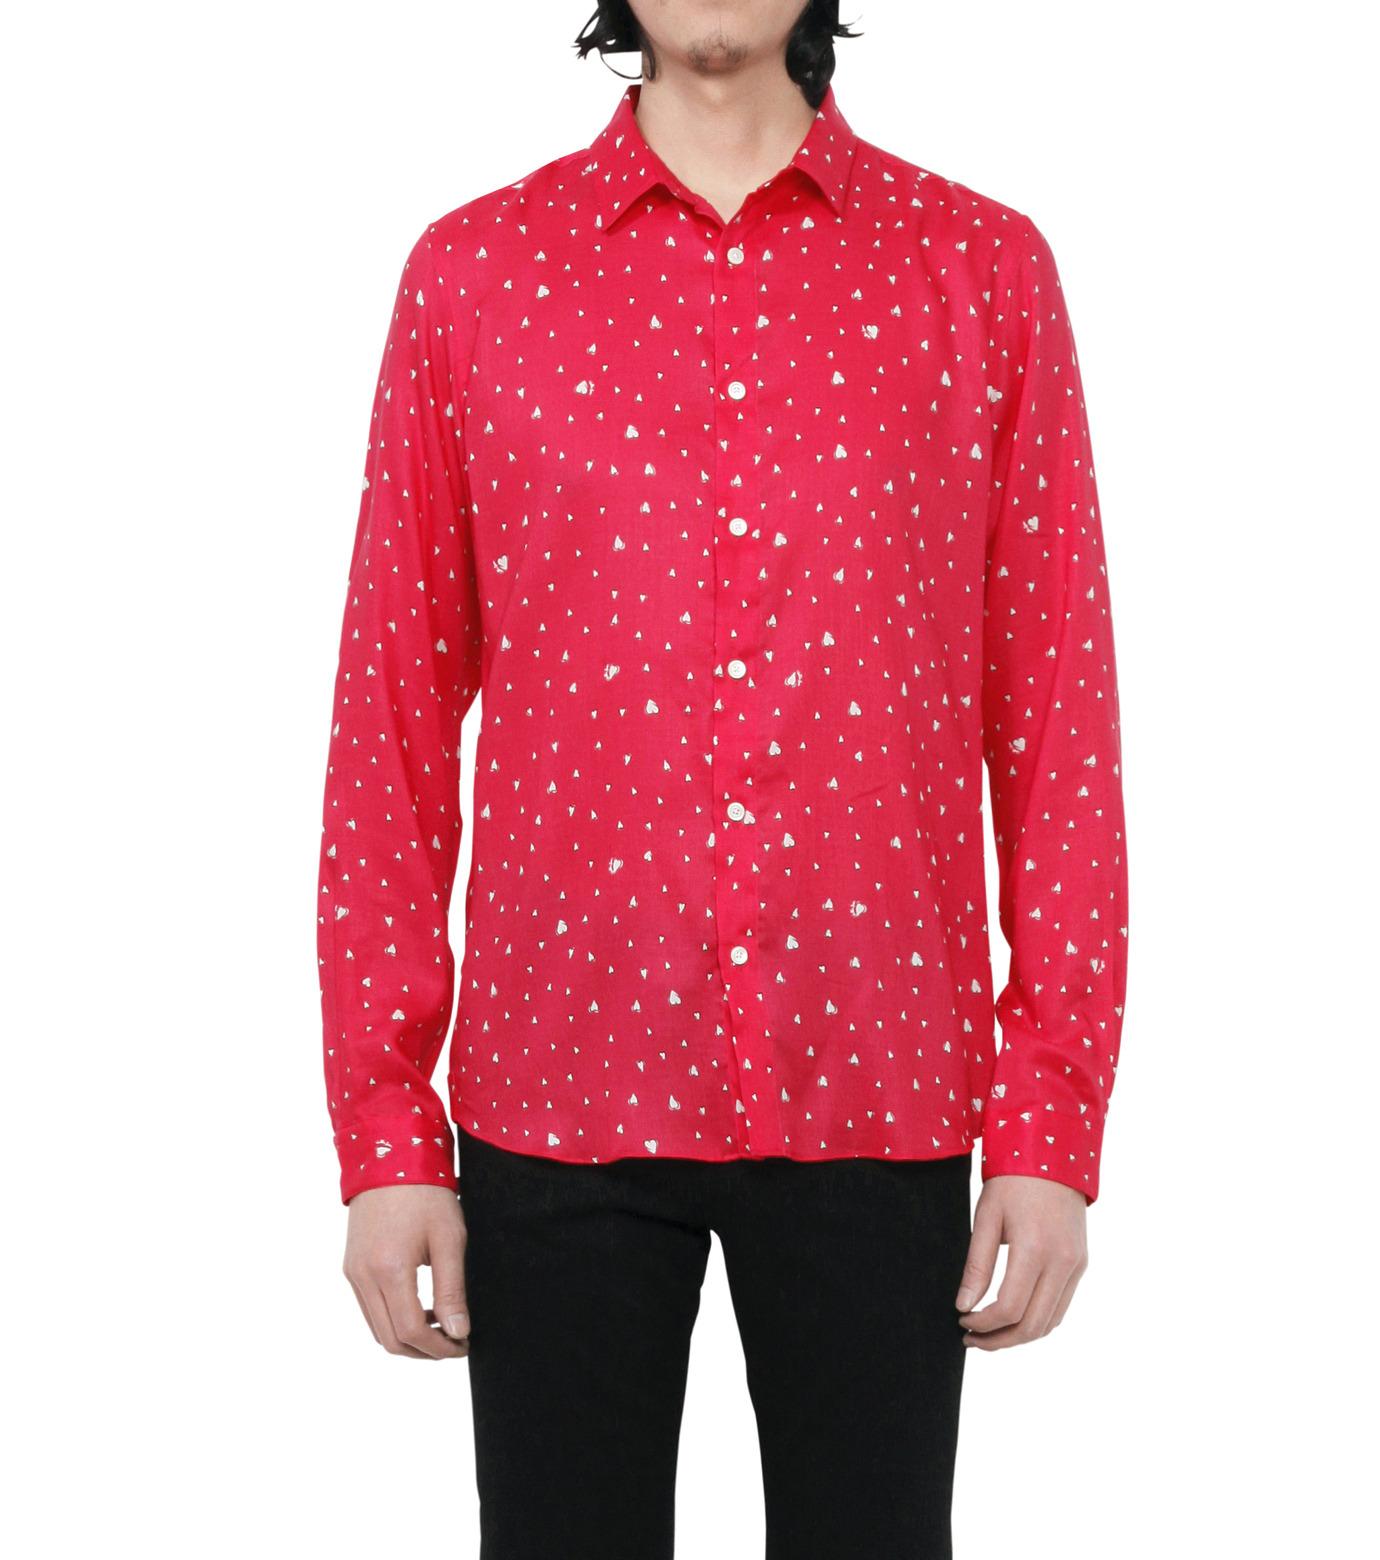 HL HEDDIE LOVU(エイチエル・エディールーヴ)のHEART PATTERN SHIRT-PINK(シャツ/shirt)-18S93001-72 拡大詳細画像3